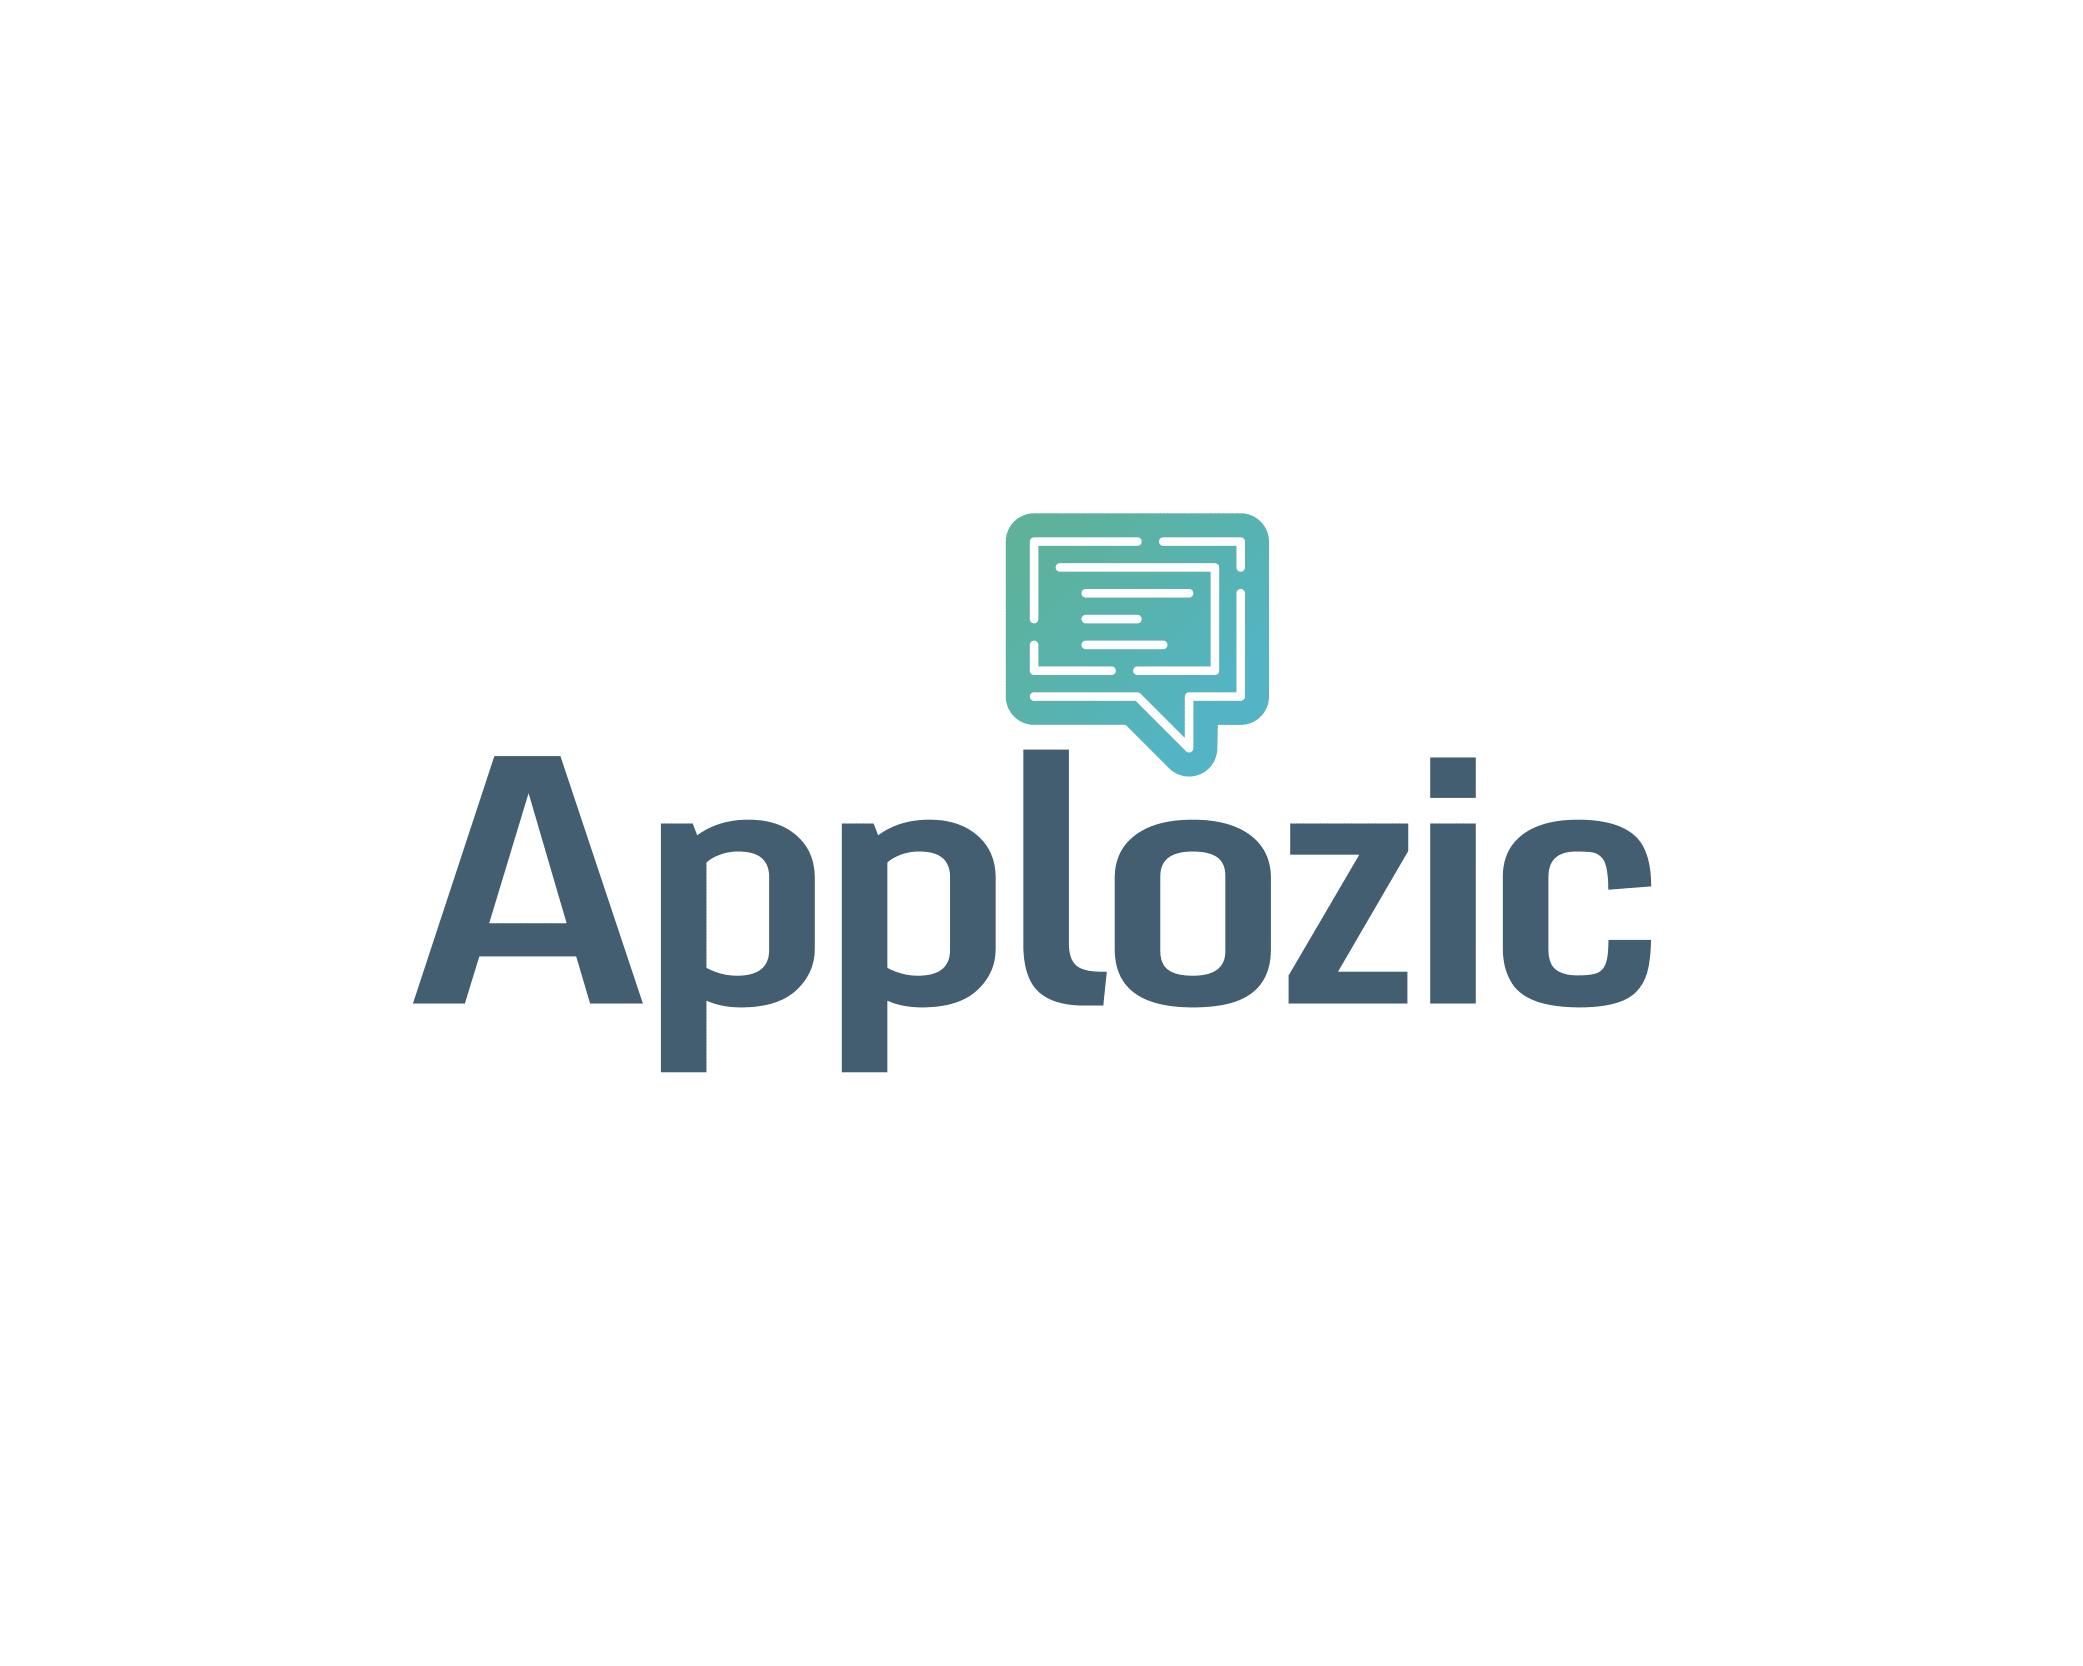 Applozic Inc